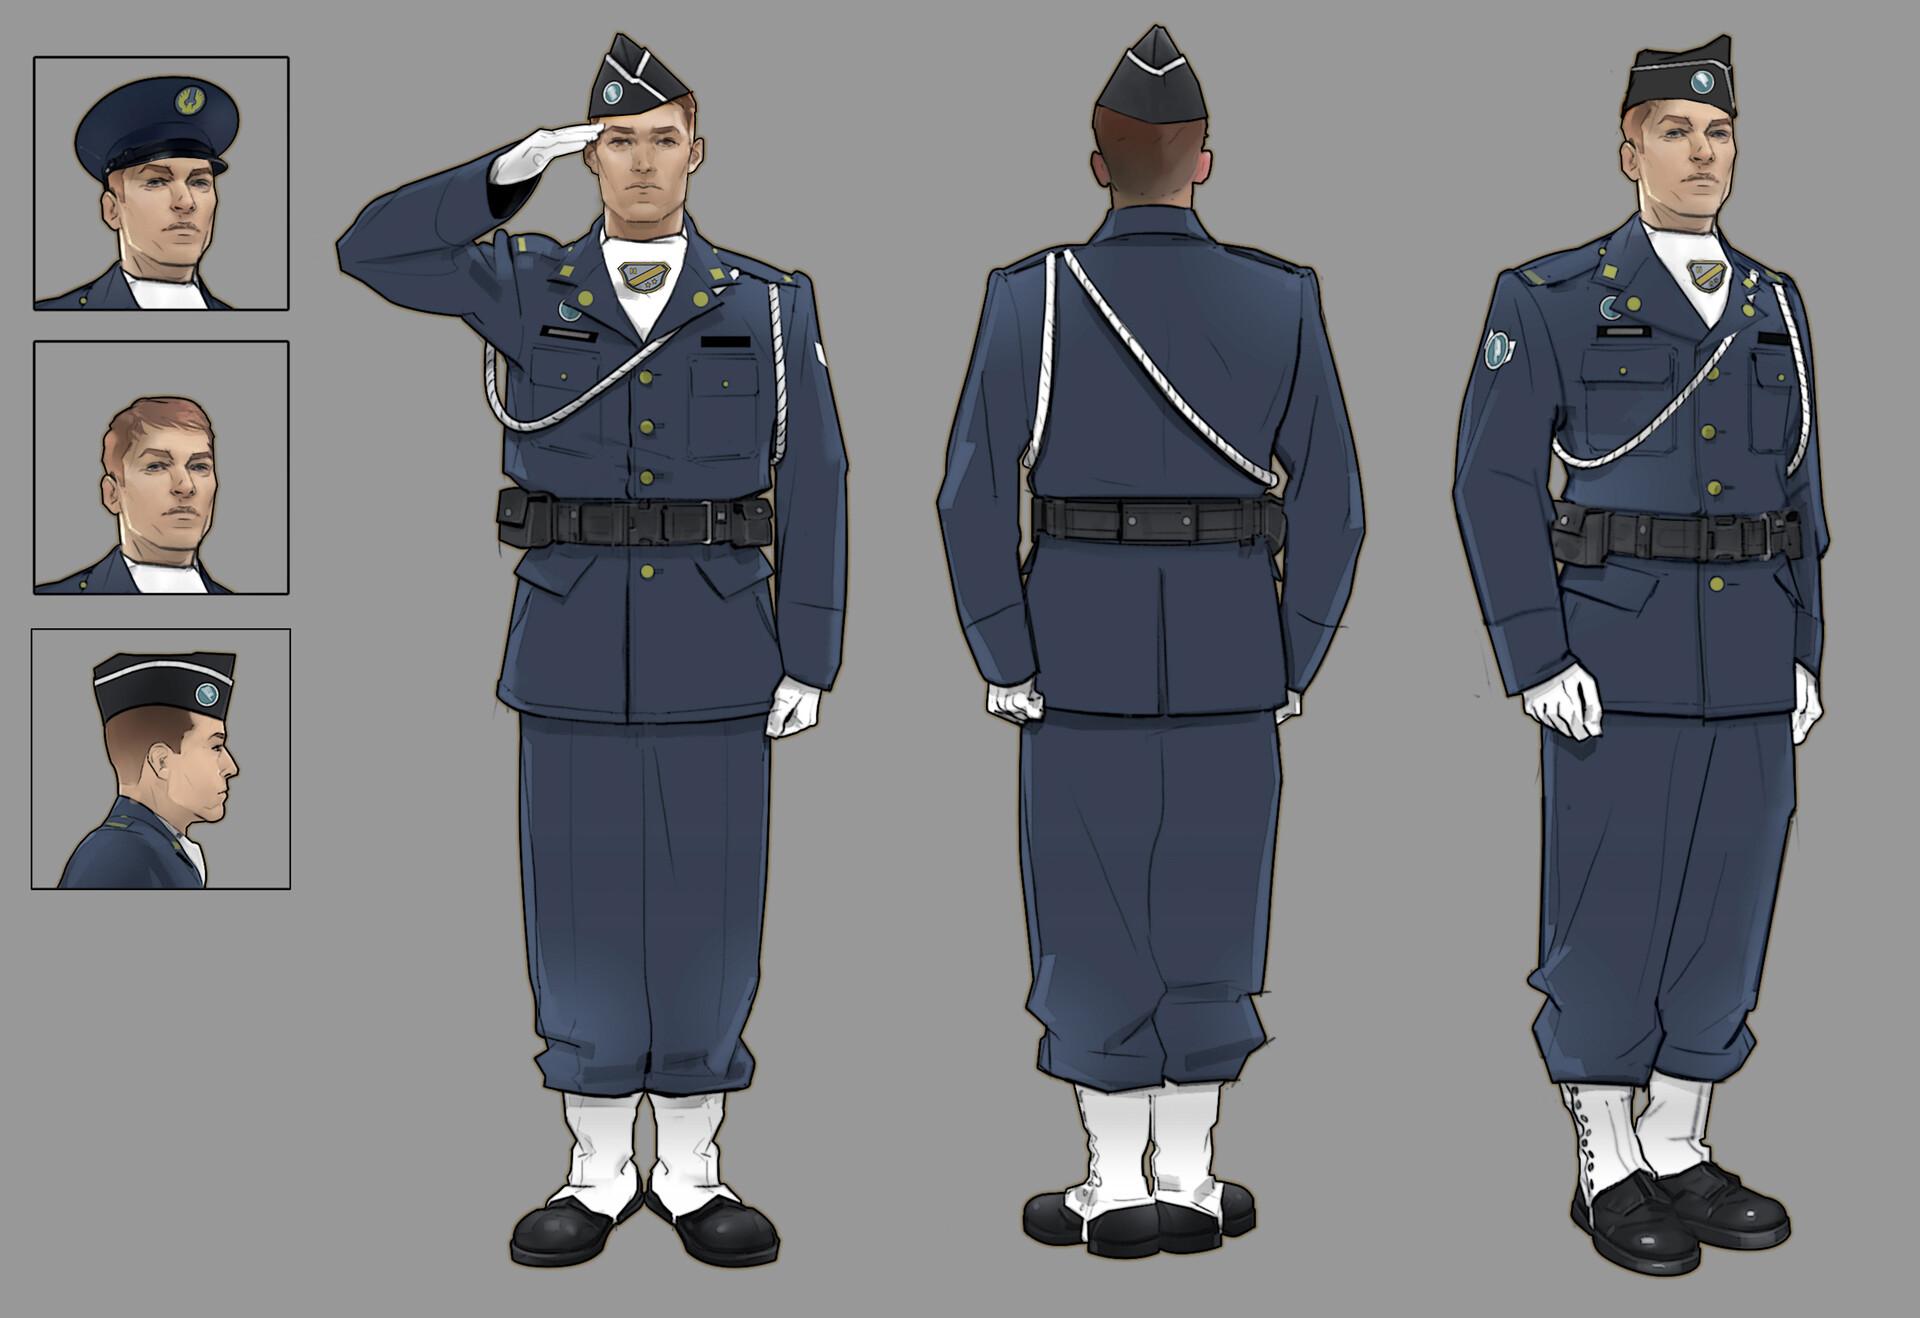 Chris ortega military outfit